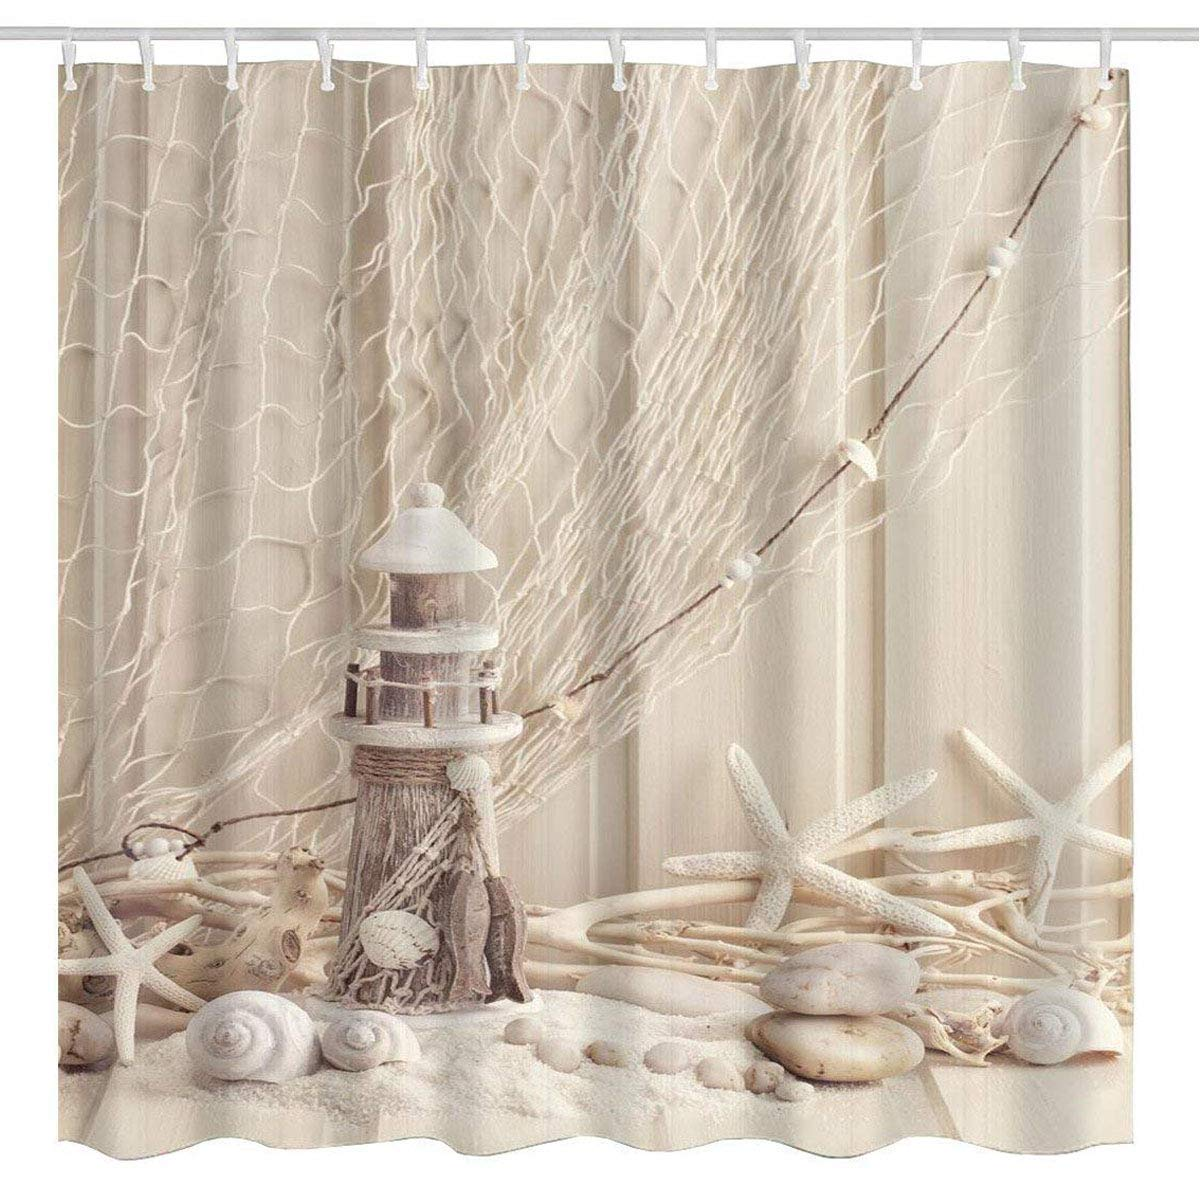 Buy Broshan Nautical Seashell Decor Shower Curtain Fabric